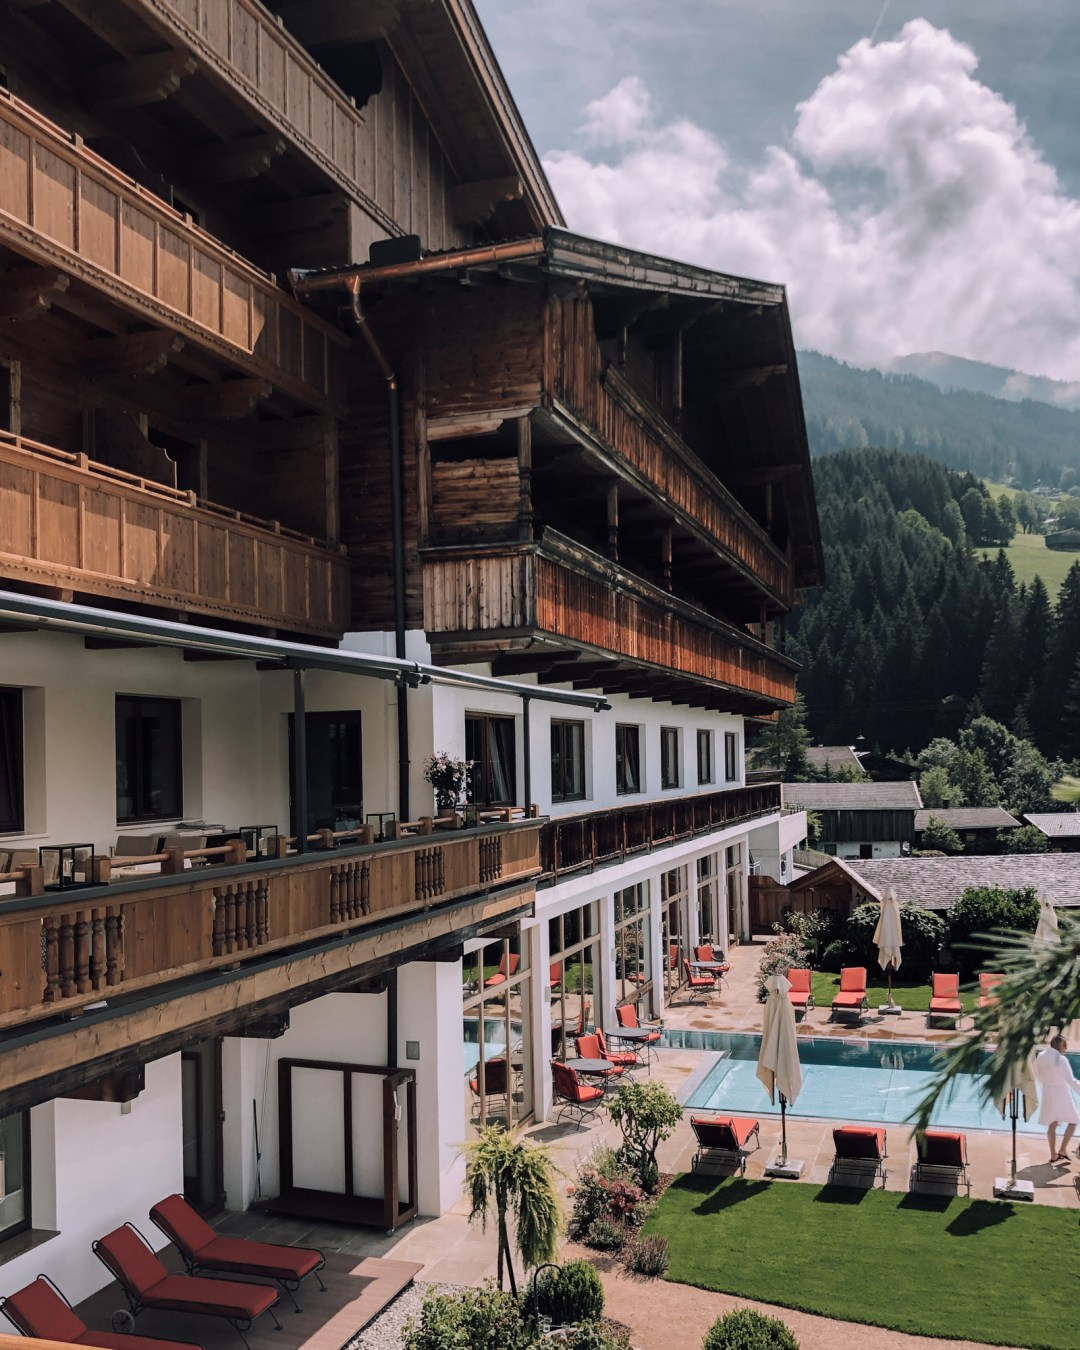 inastil, over50blogger, Alpbach, Alpbacherhof, Tirol, Austria, Visittirol, Wandern, Mountainbike, travelblogger, traveldiary, Urlaub, Urlaubinösterreich